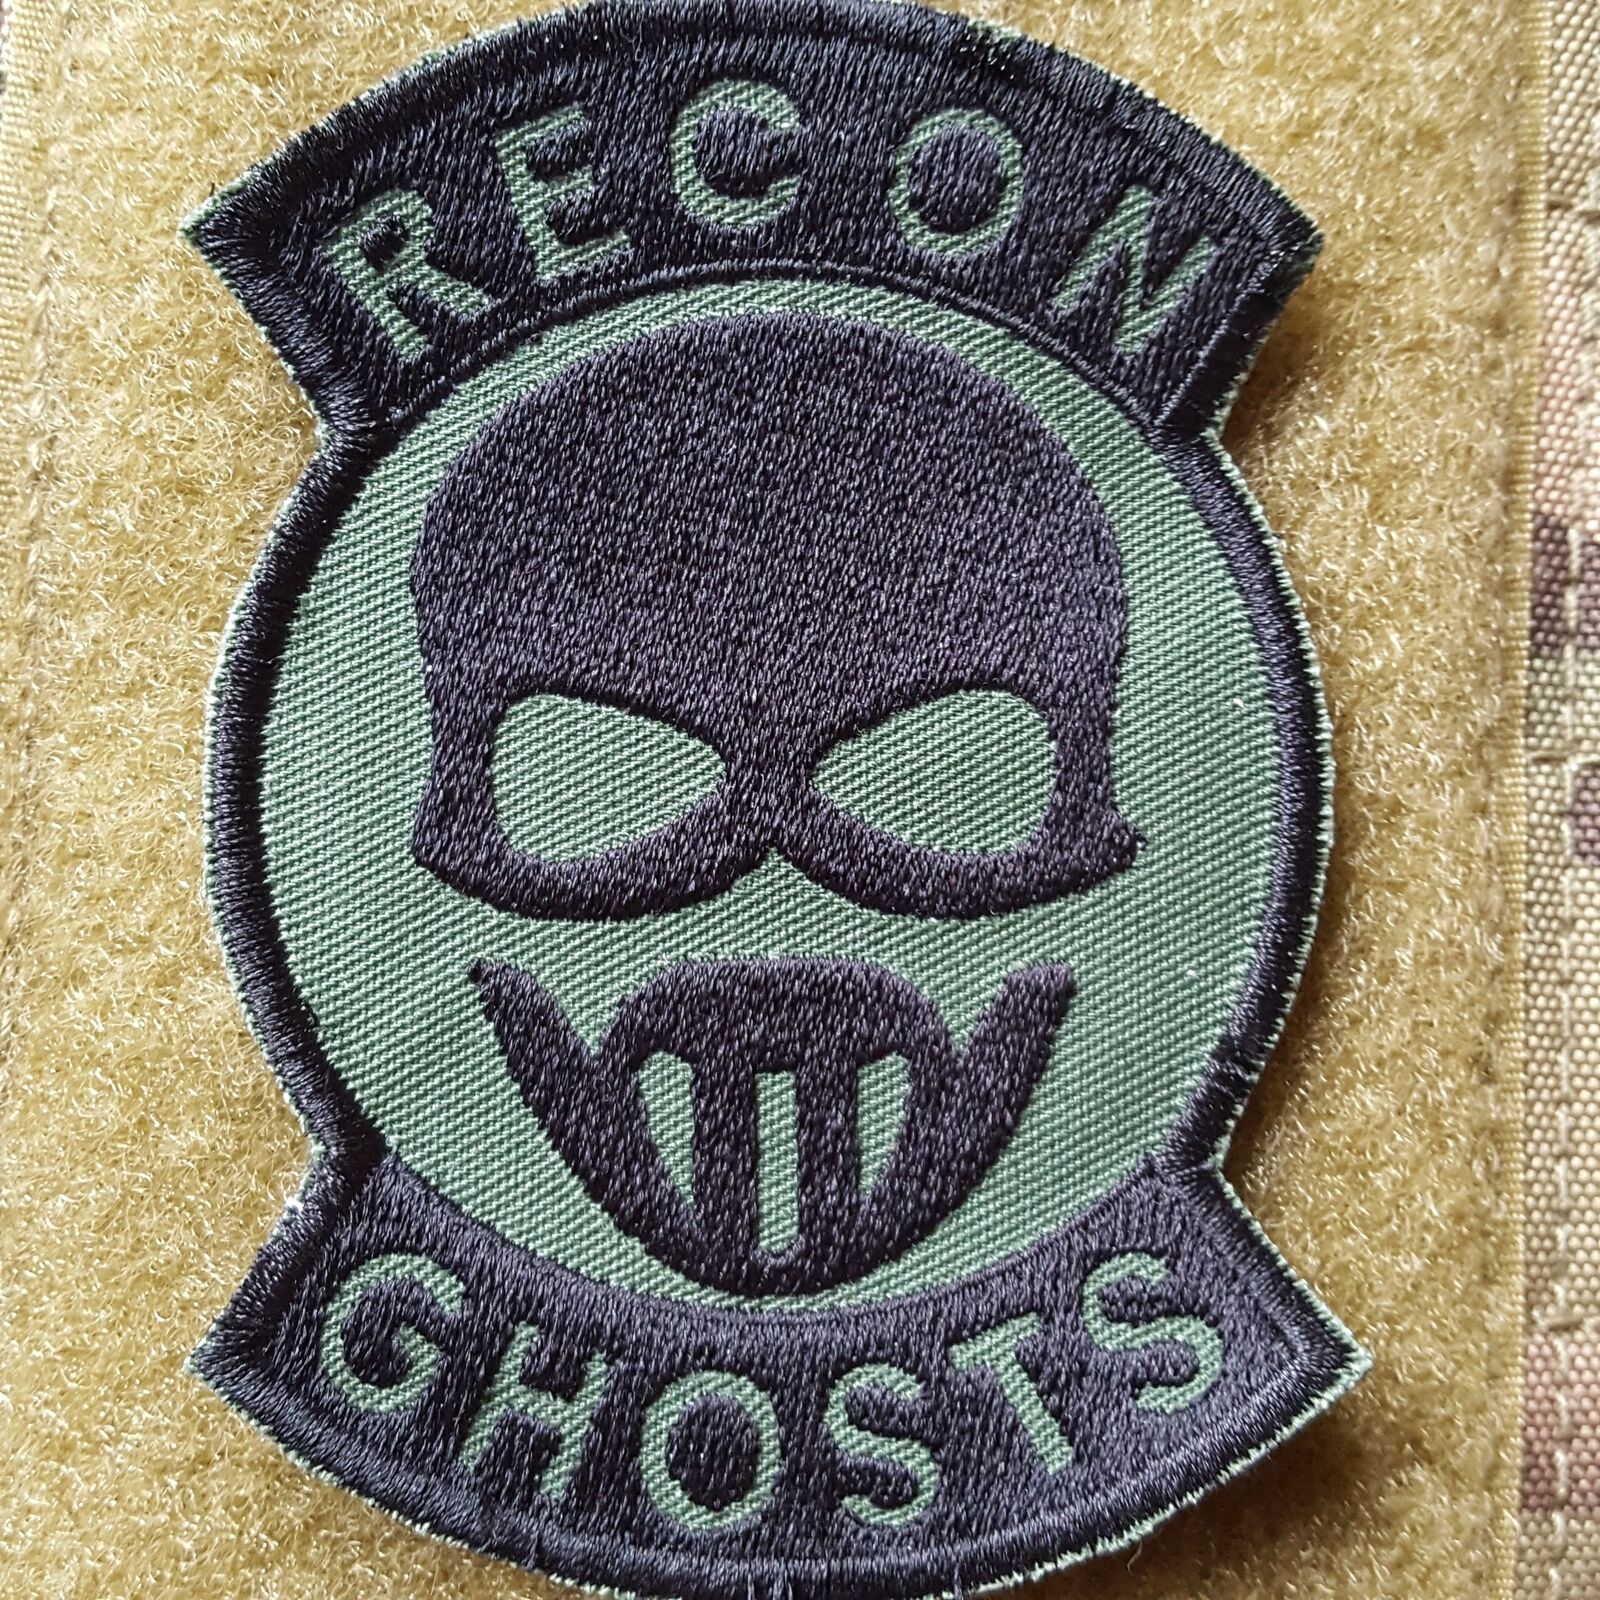 Recon Ghosts COS Ksk SAS SP SP SP Ops Tactical morale écusson velcro patch olive NEUF 762475